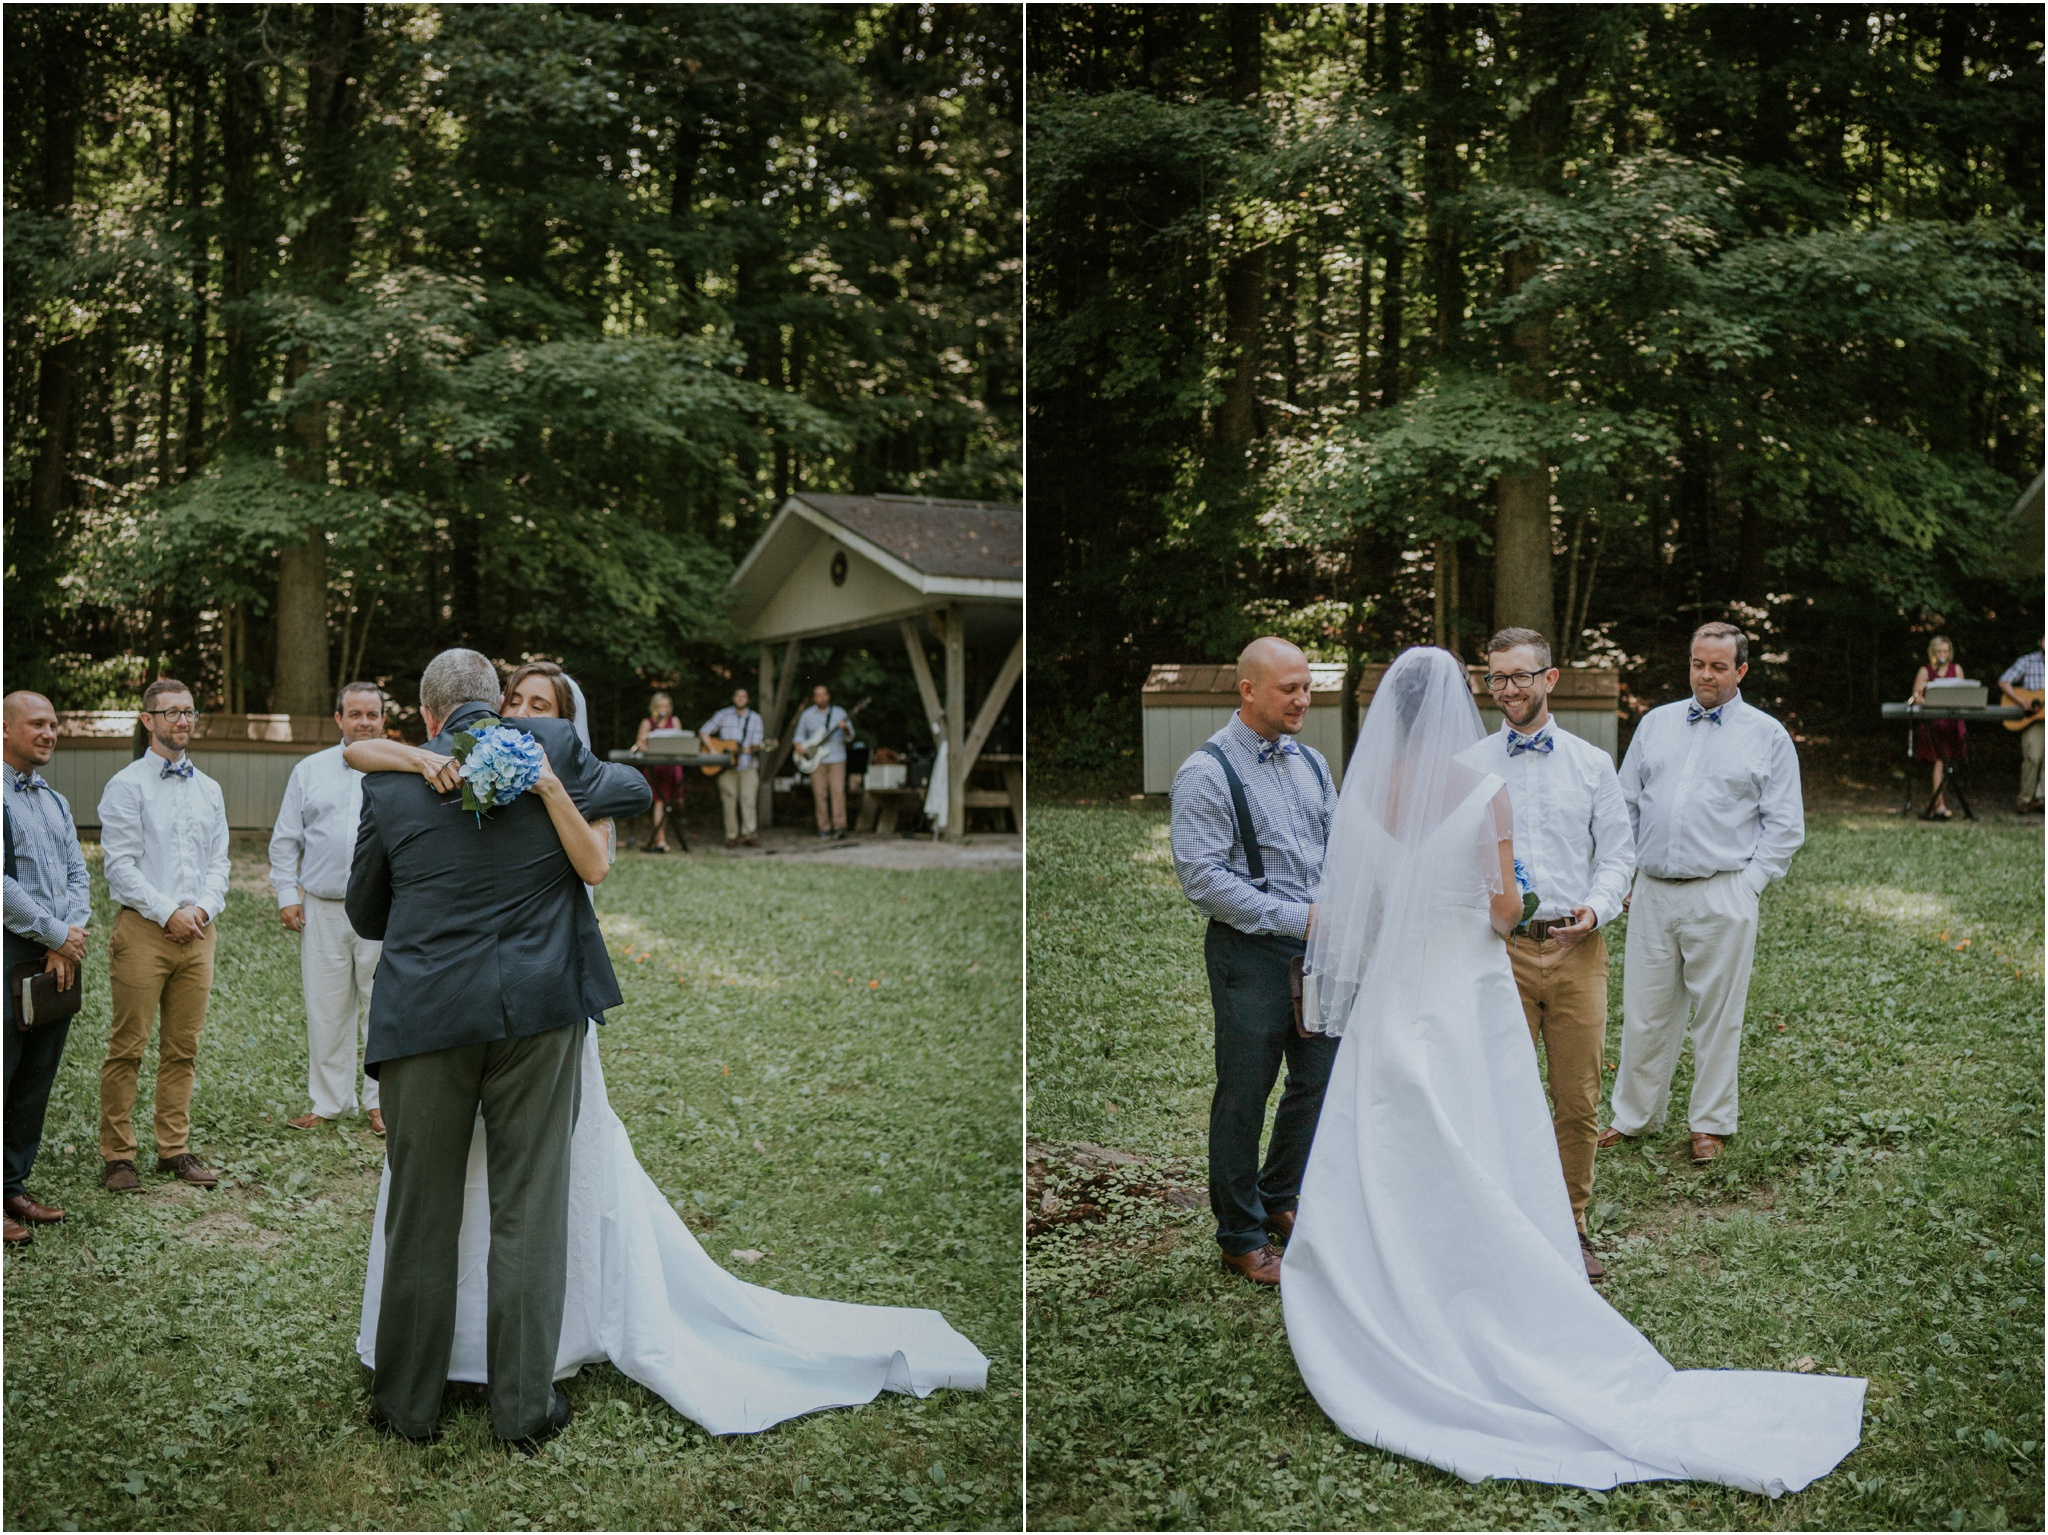 sugar-hollow-park-bristol-virginia-wedding-intimate-woodsy-black-forest-ceremony-adventurous-couple_0017.jpg